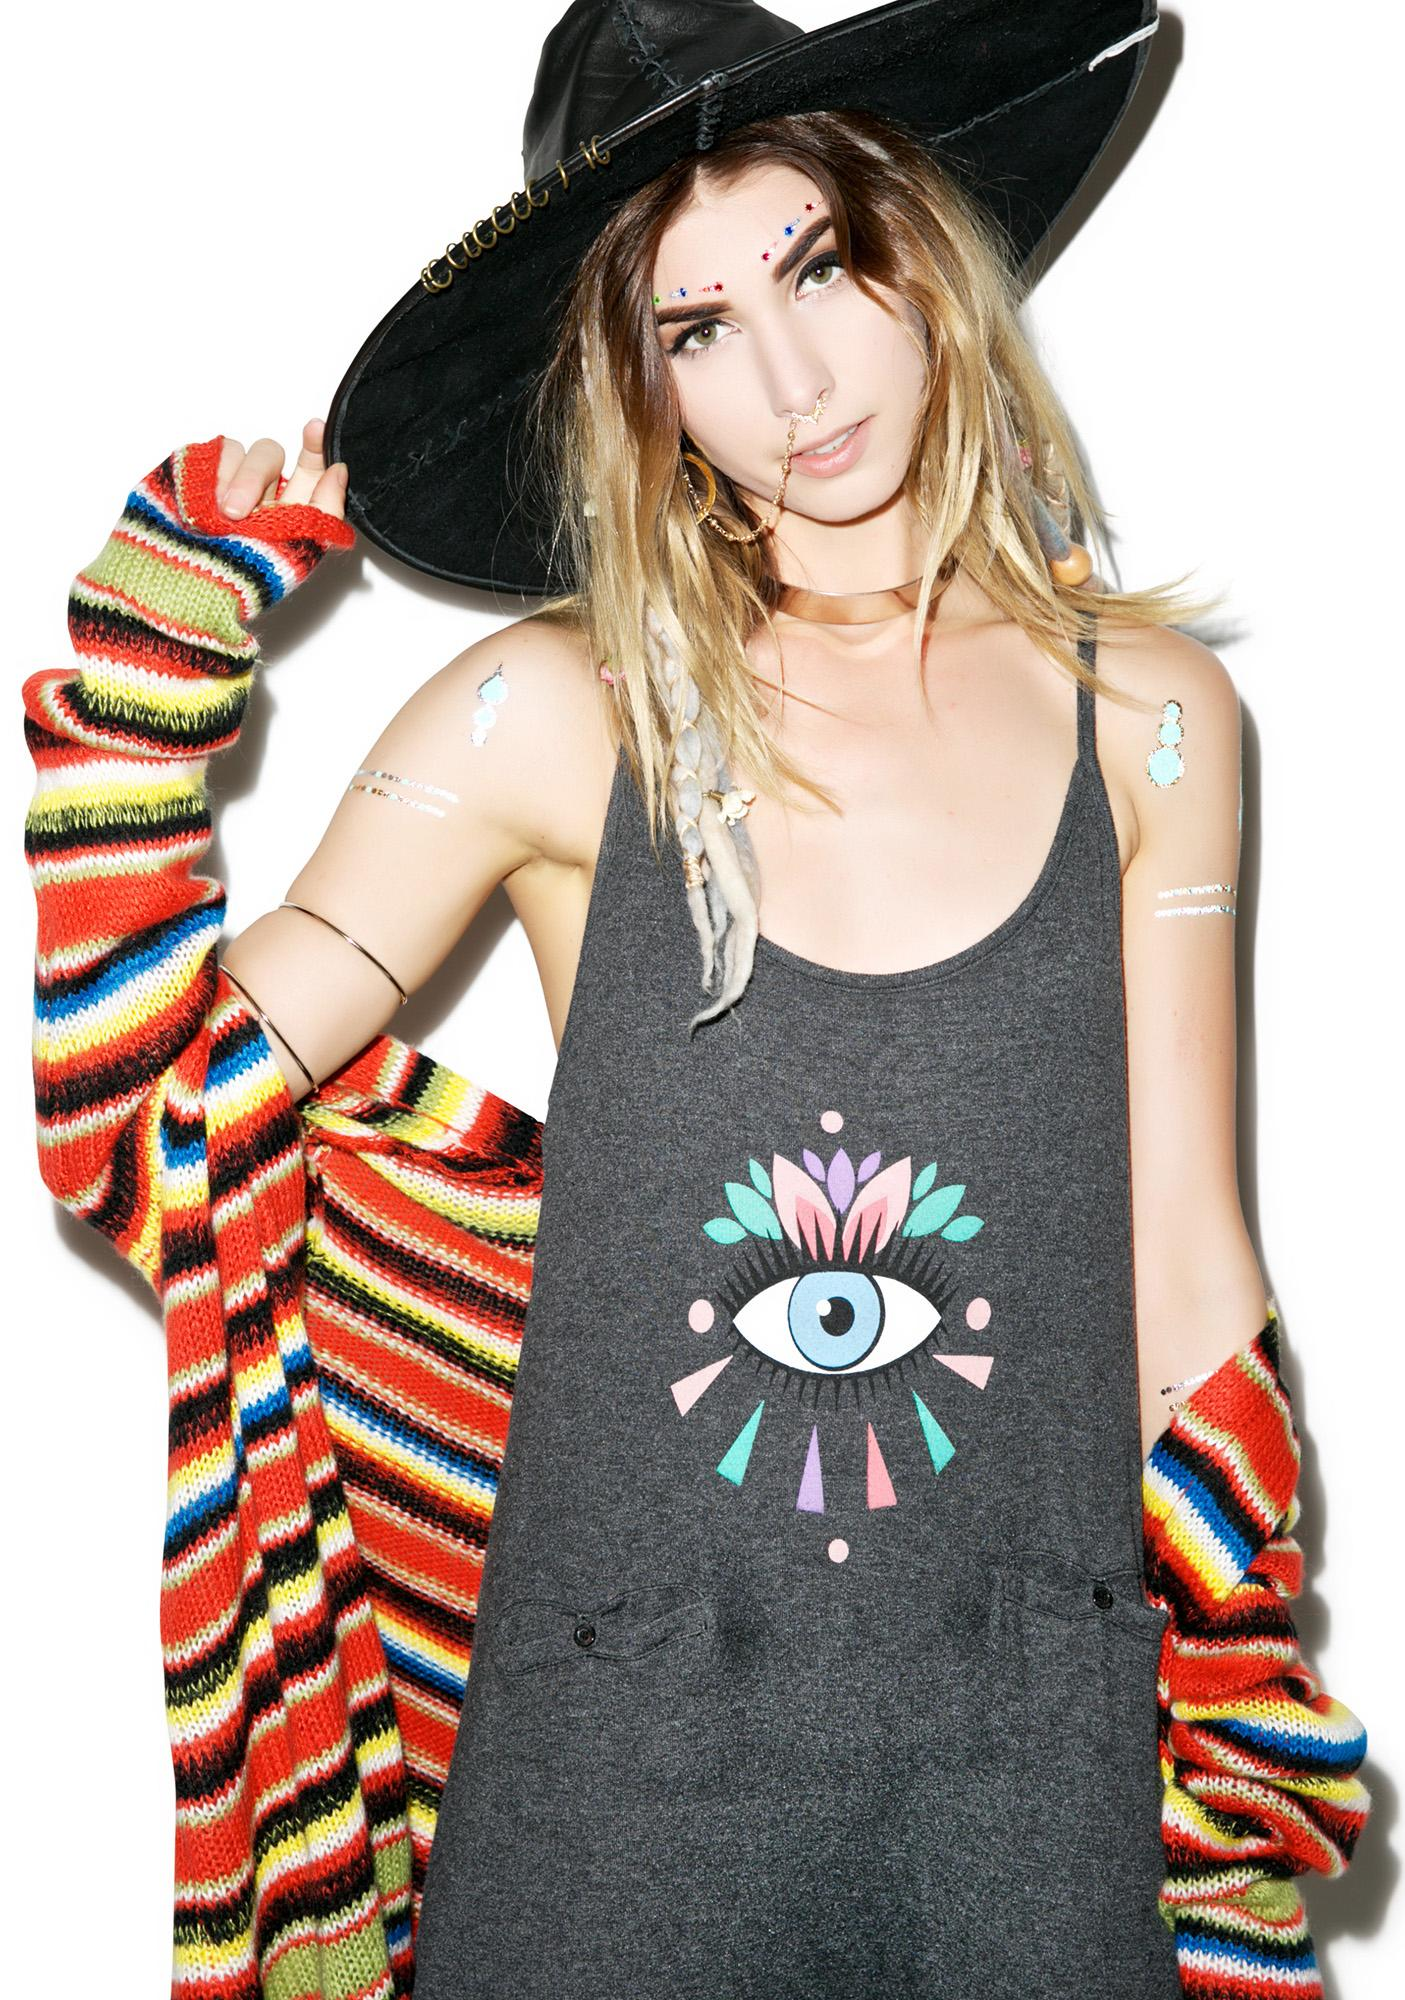 Wildfox Couture Third Eye Hampton Breeze Onesie